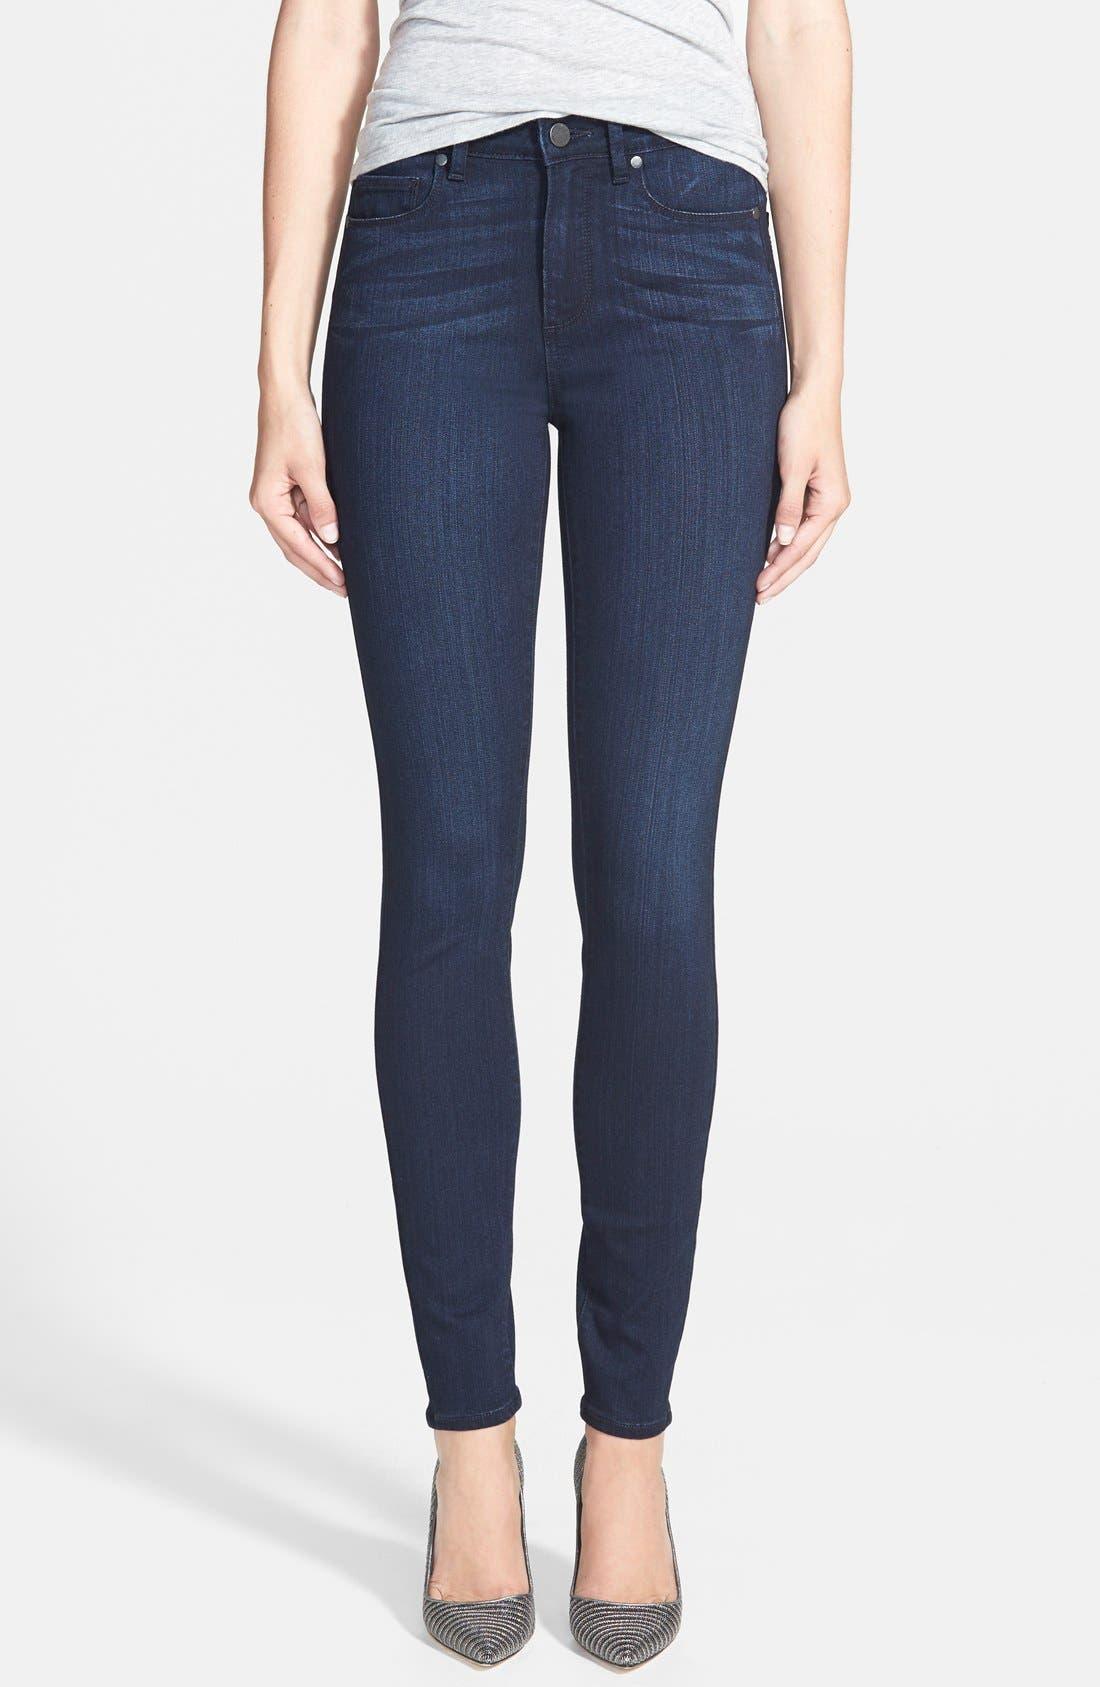 Denim 'Transcend - Hoxton' High Rise Ultra Skinny Jeans,                             Main thumbnail 1, color,                             400